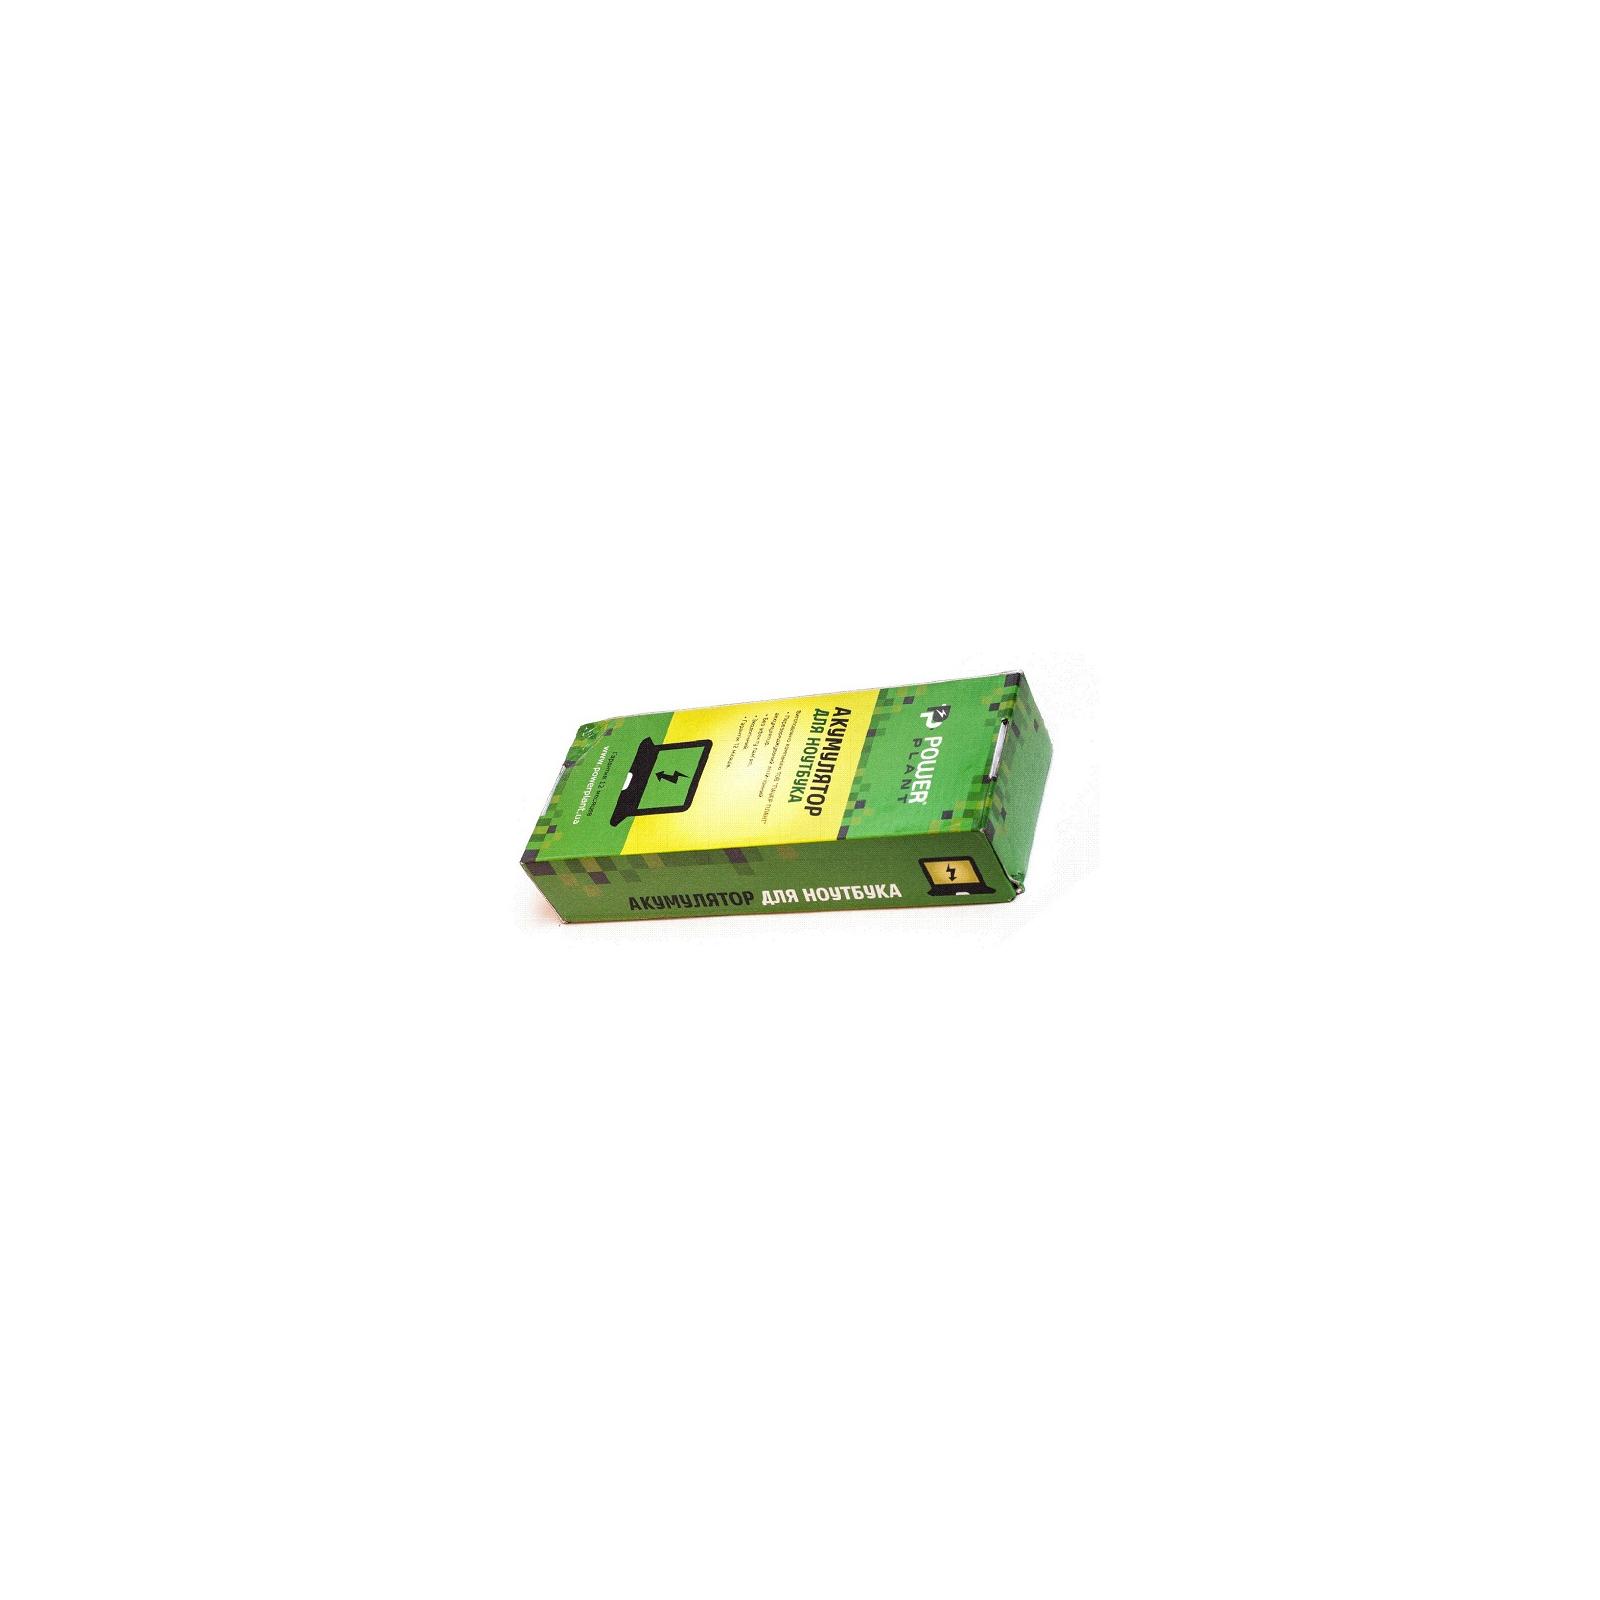 Аккумулятор для ноутбука DELL Inspiron Mini 10 (H766N, DL1011LH) 11.1V 5200mAh PowerPlant (NB00000113) изображение 3